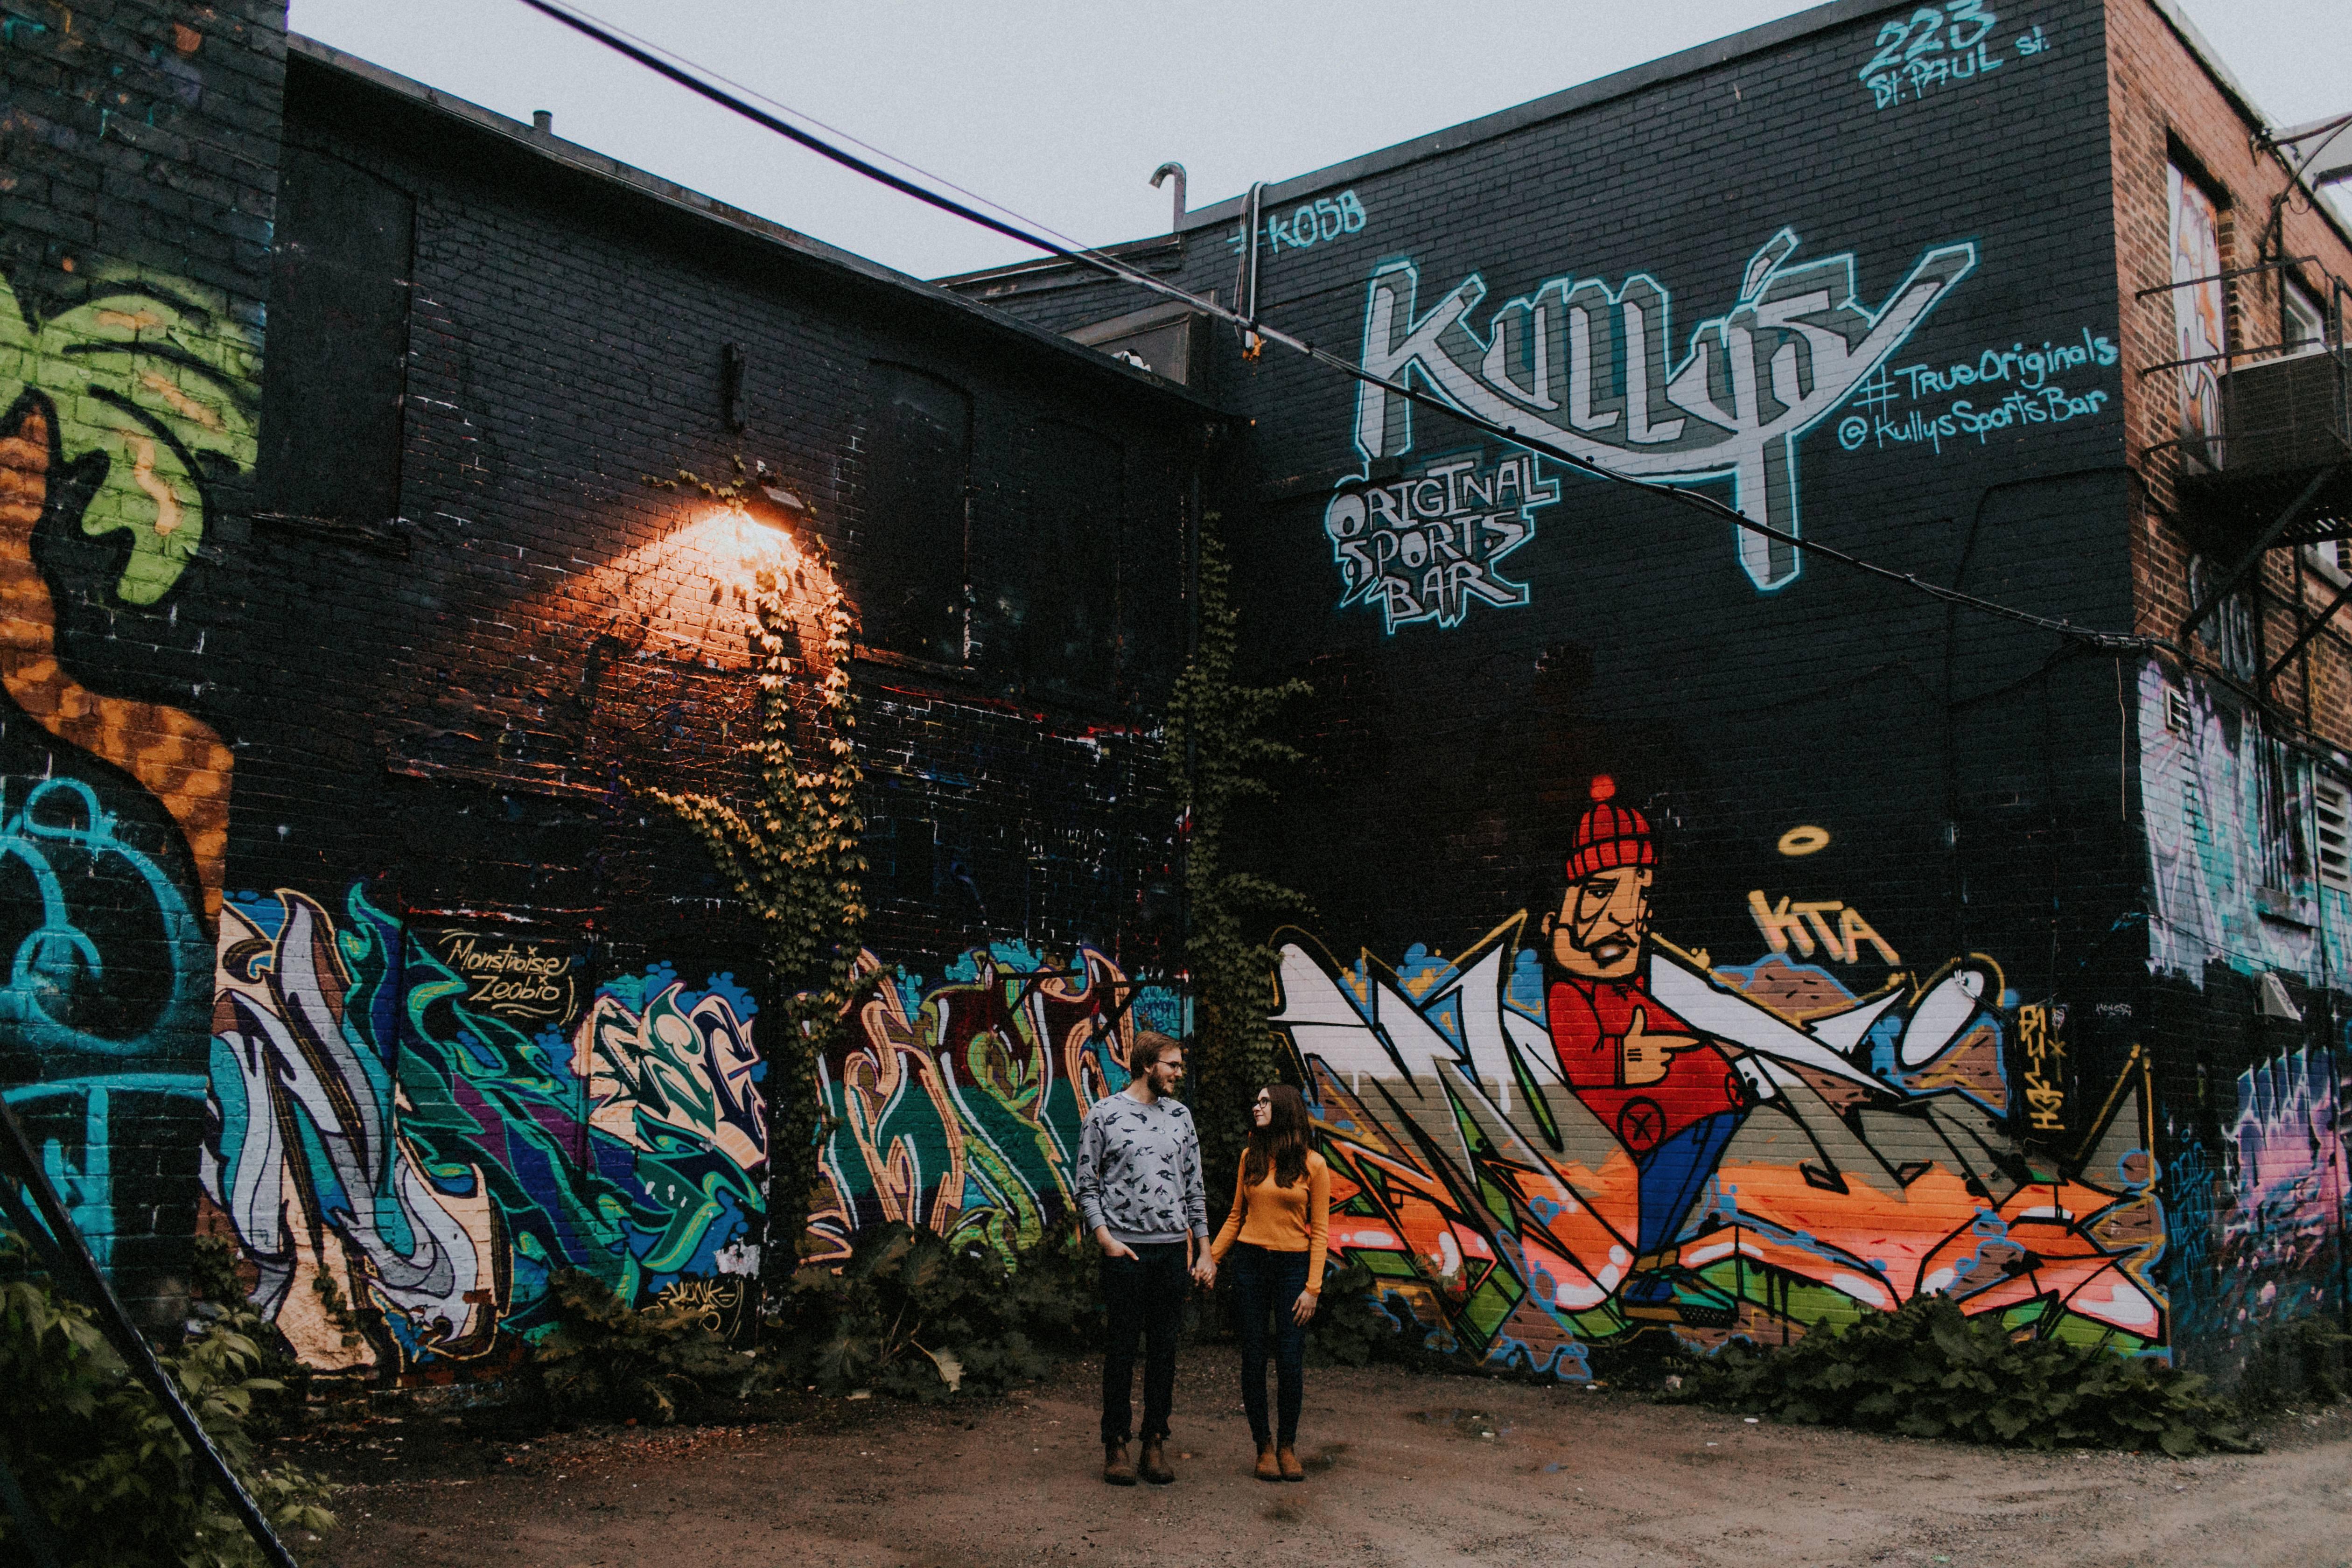 couple standing by graffiti